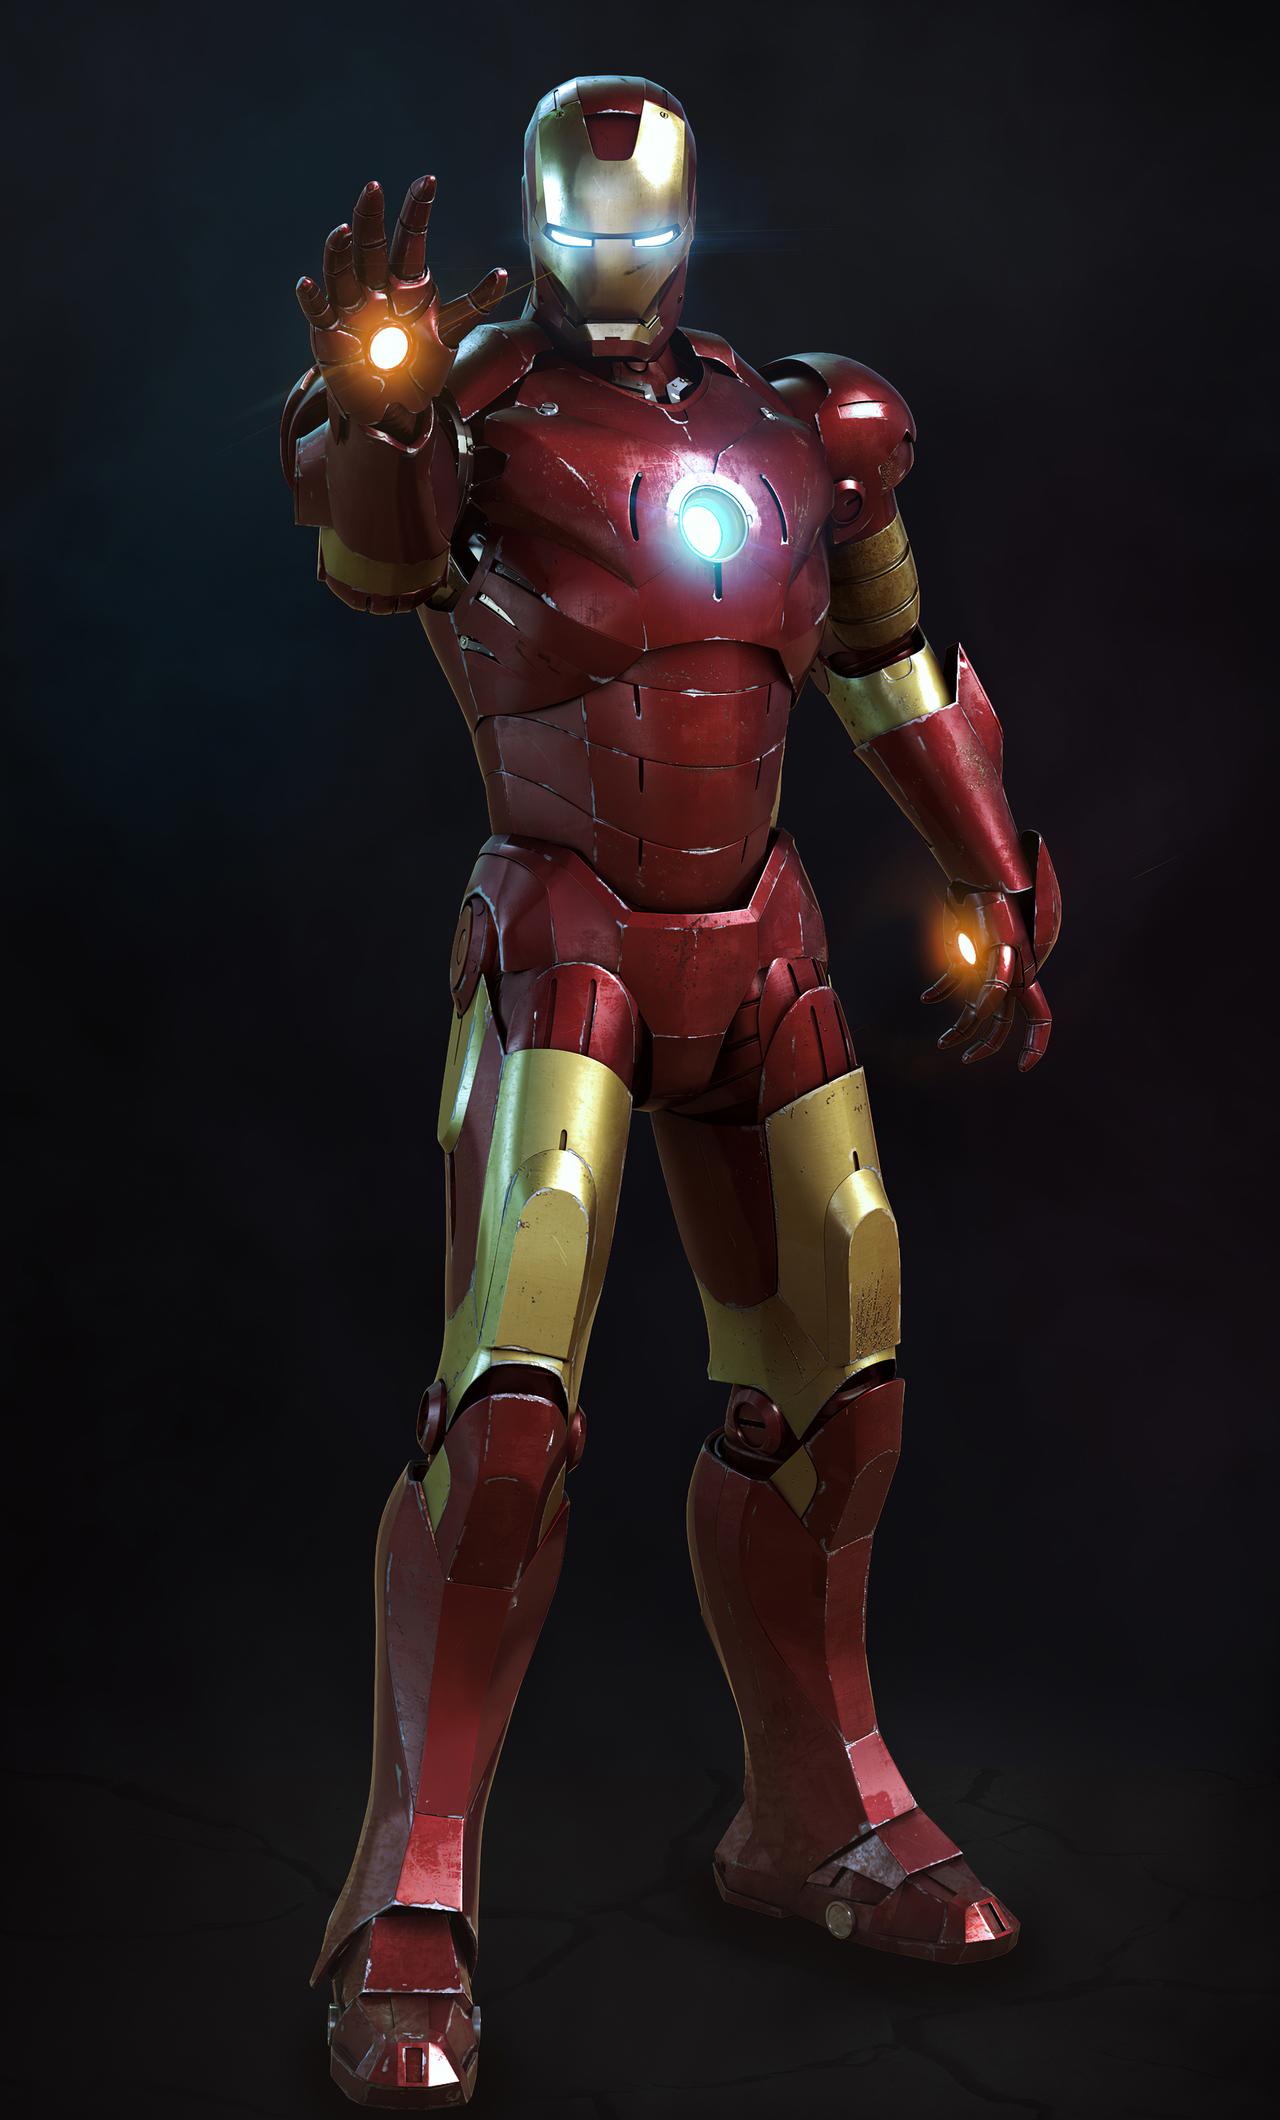 4k-iron-man2020-9c.jpg